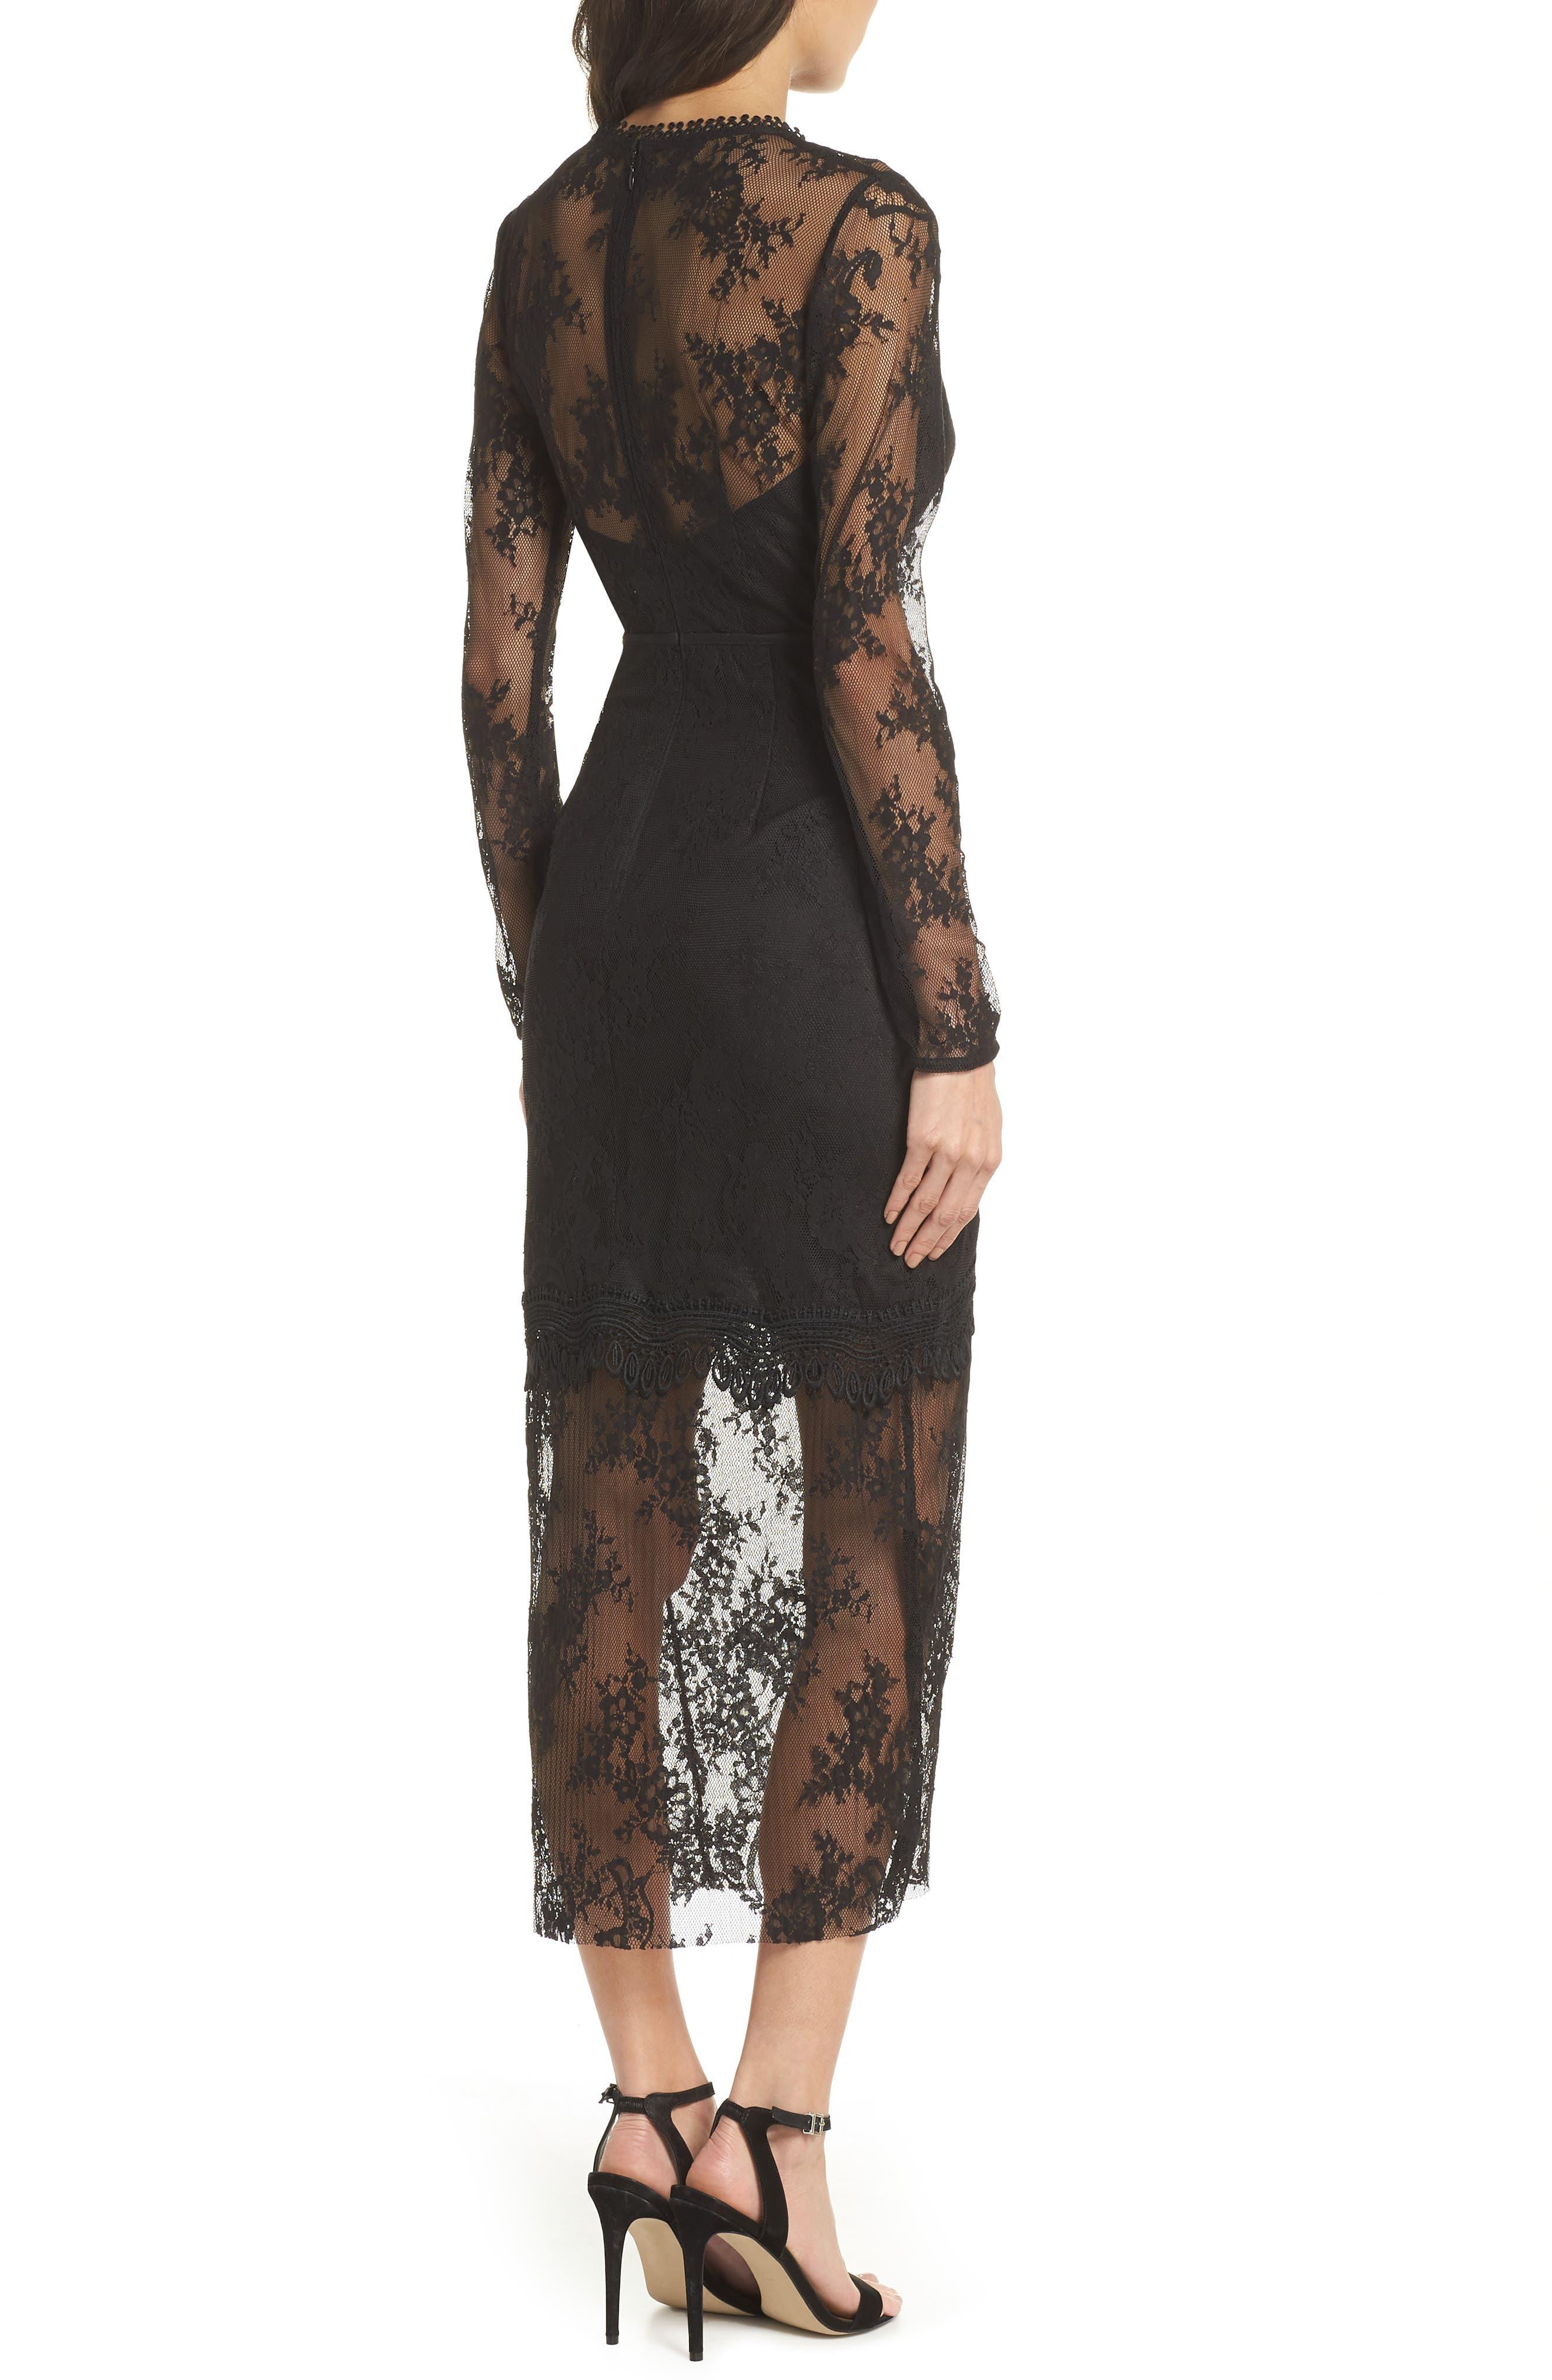 True Chemistry Lace Sheath Dress,                             Alternate thumbnail 2, color,                             001